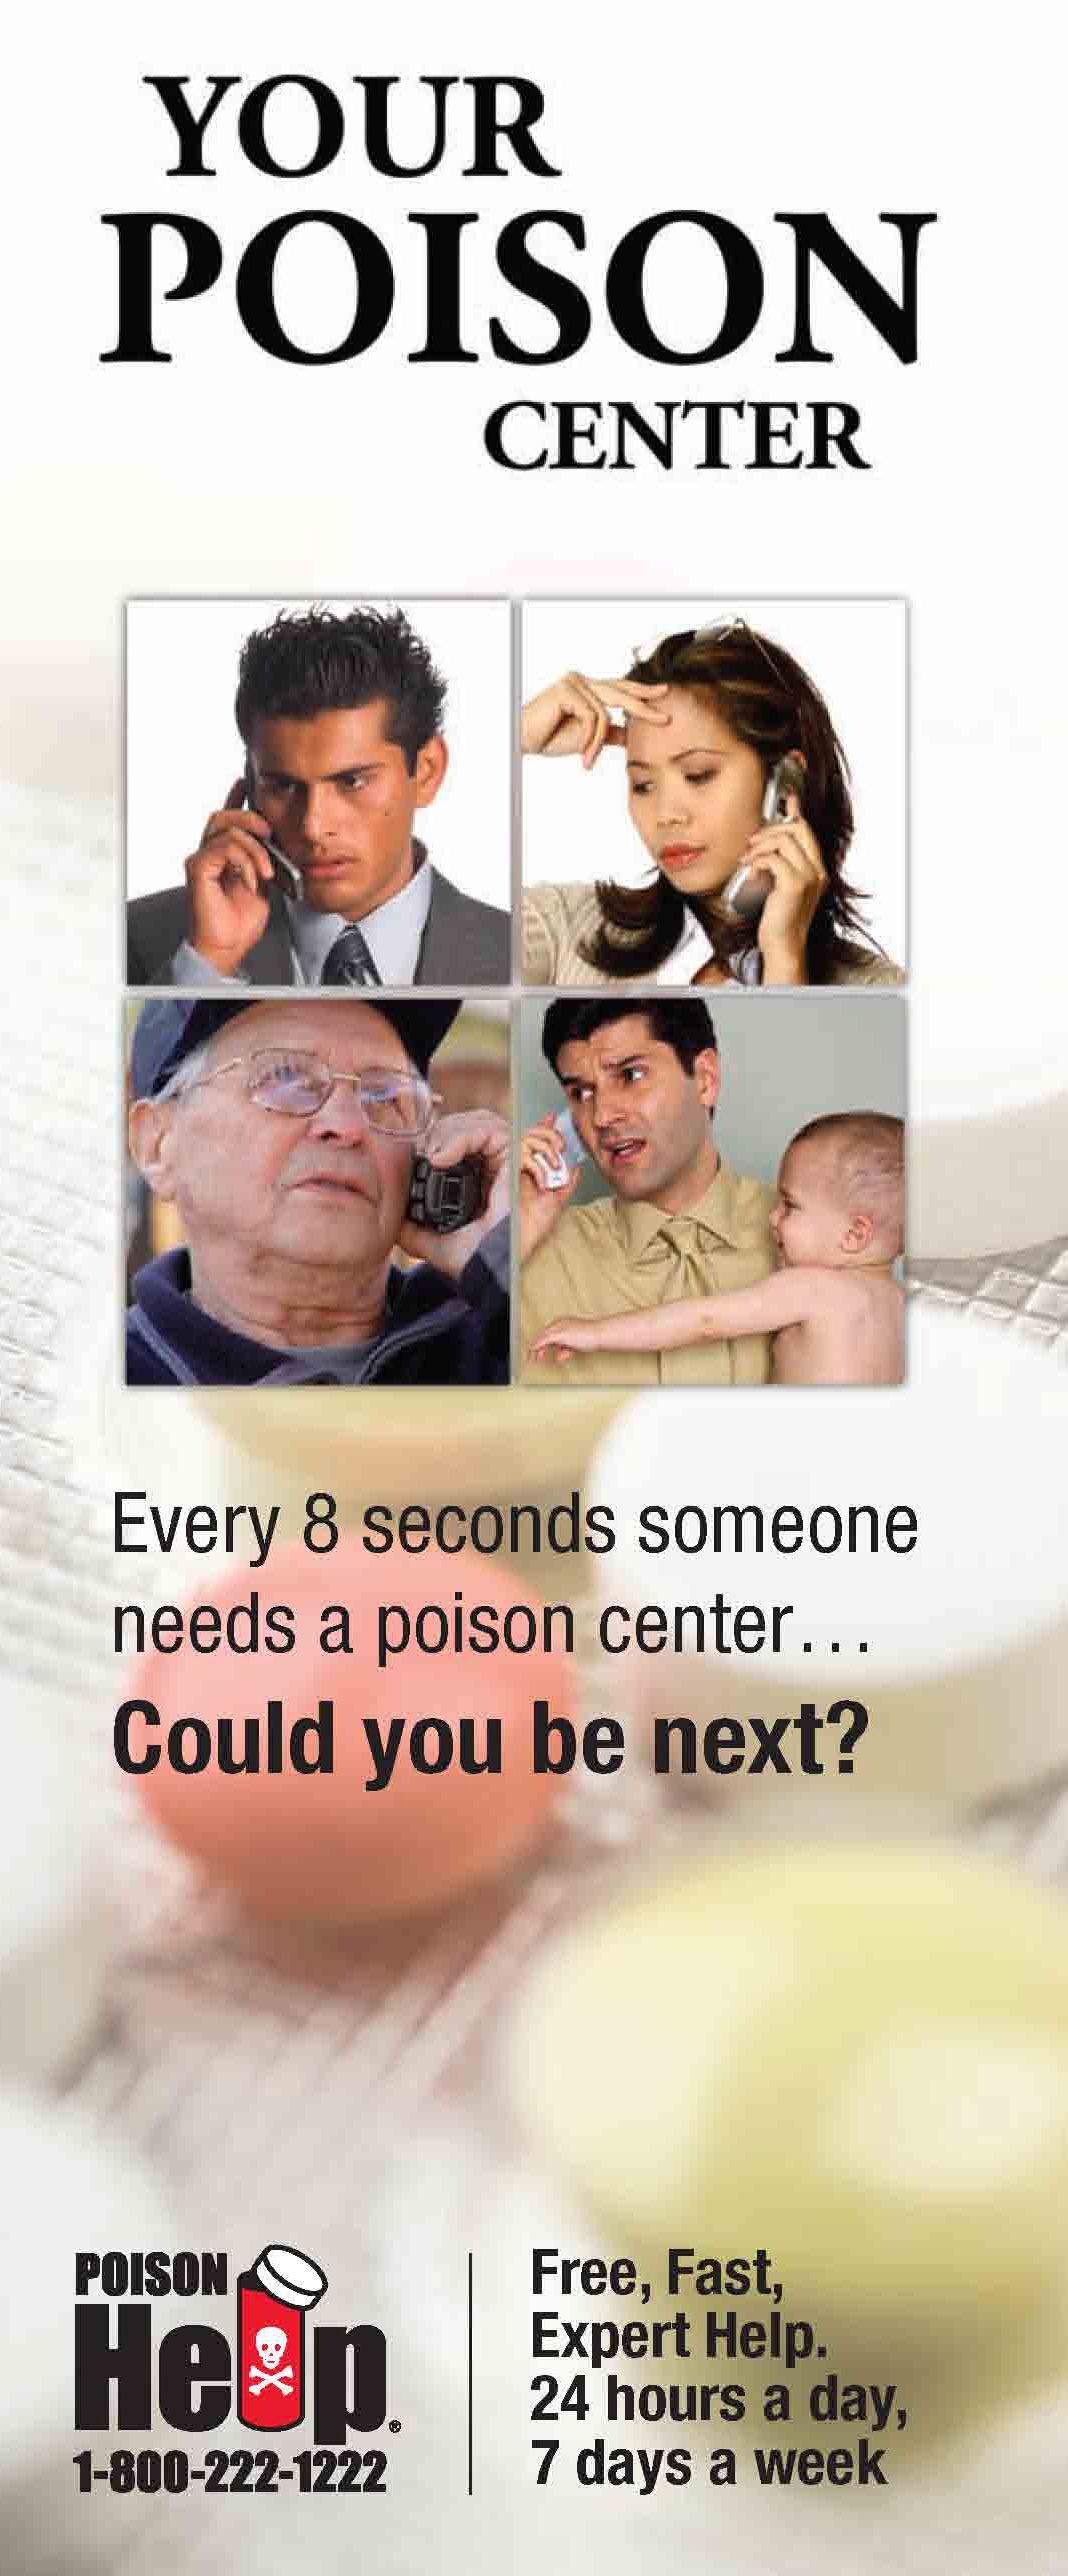 U.S. Poison Center Hotline 8002221222. For more info on